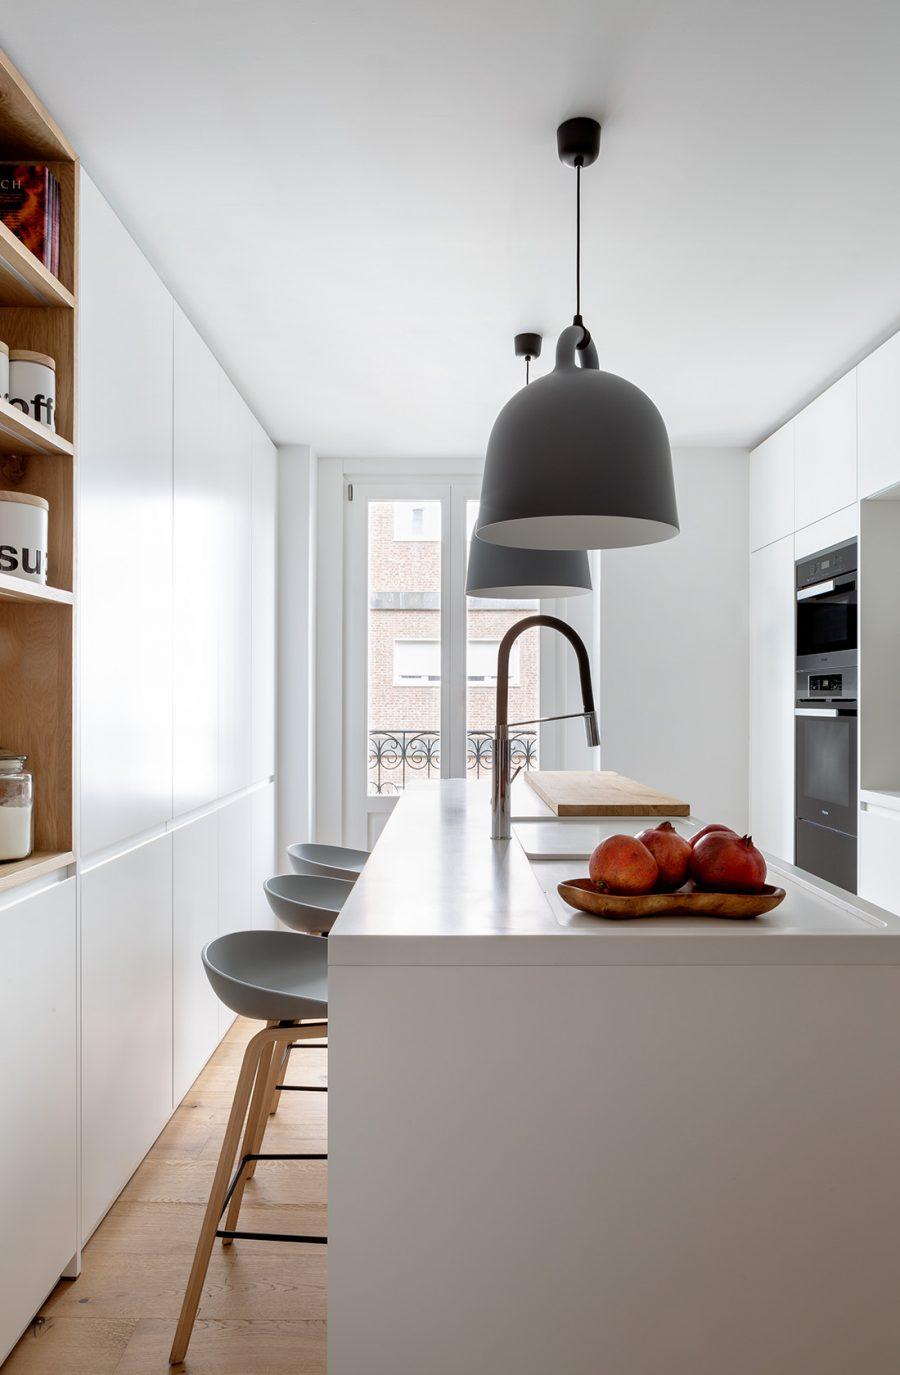 Reforma integral duplex serrano casa ayala ii cocina 01